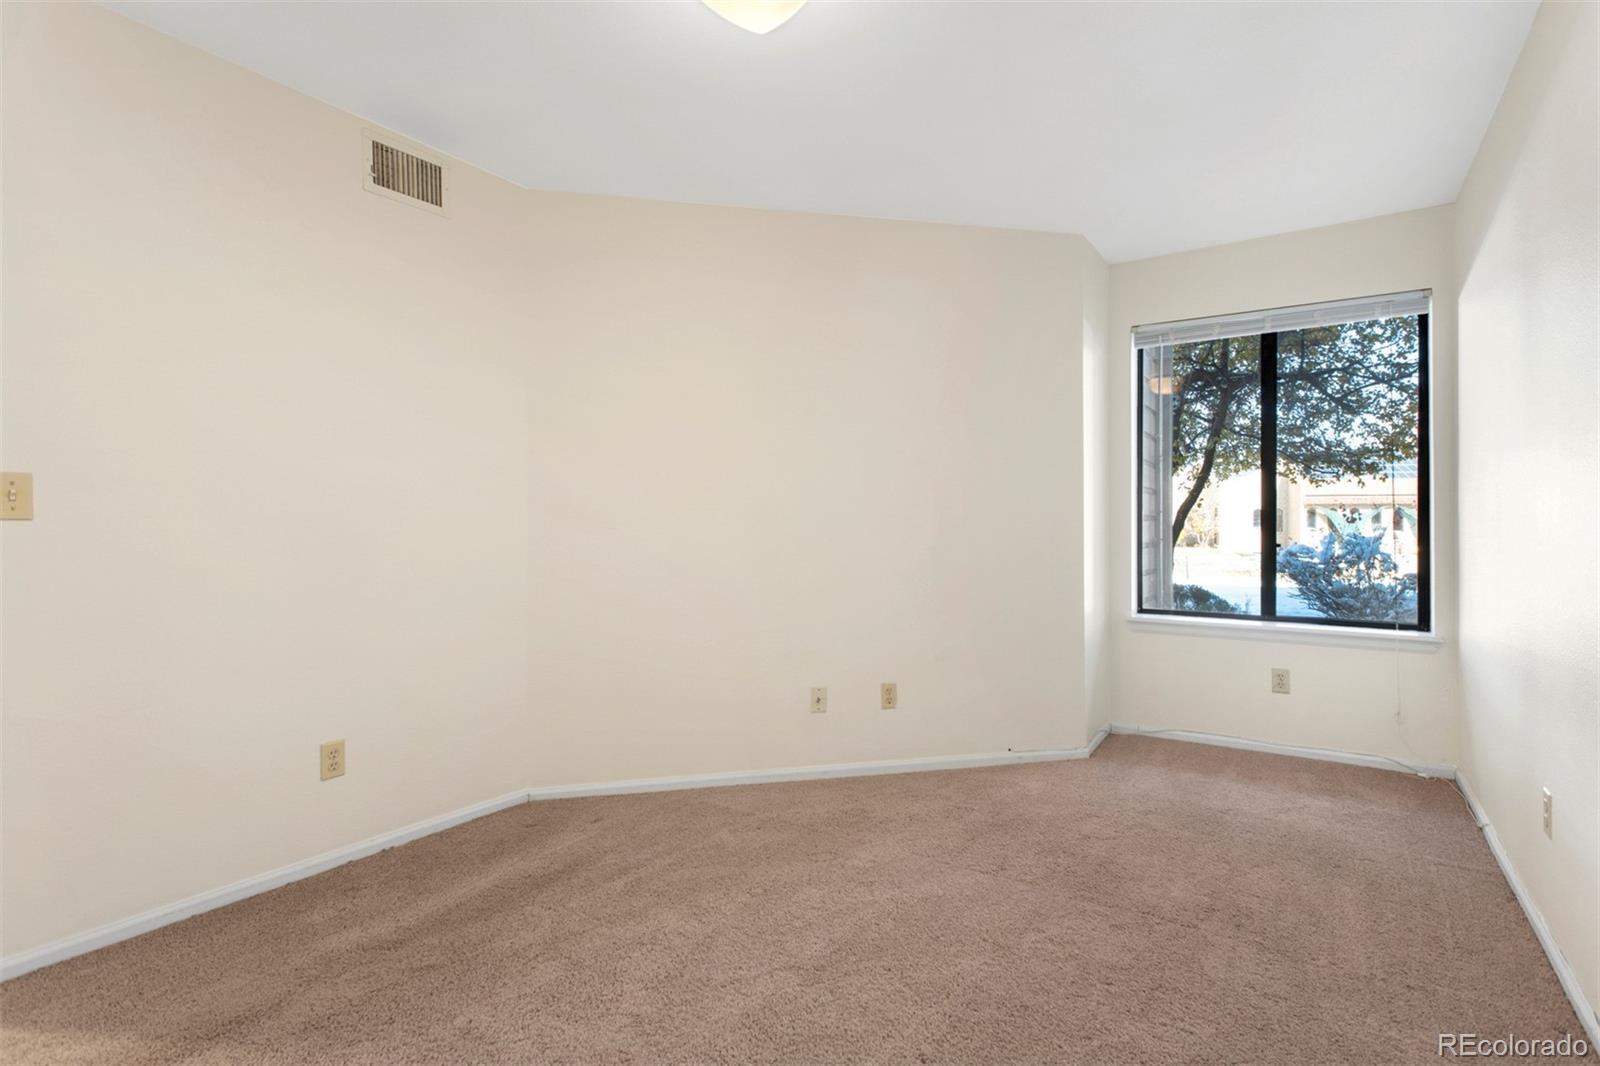 MLS# 3826145 - 12 - 2727 Folsom Street #123, Boulder, CO 80304